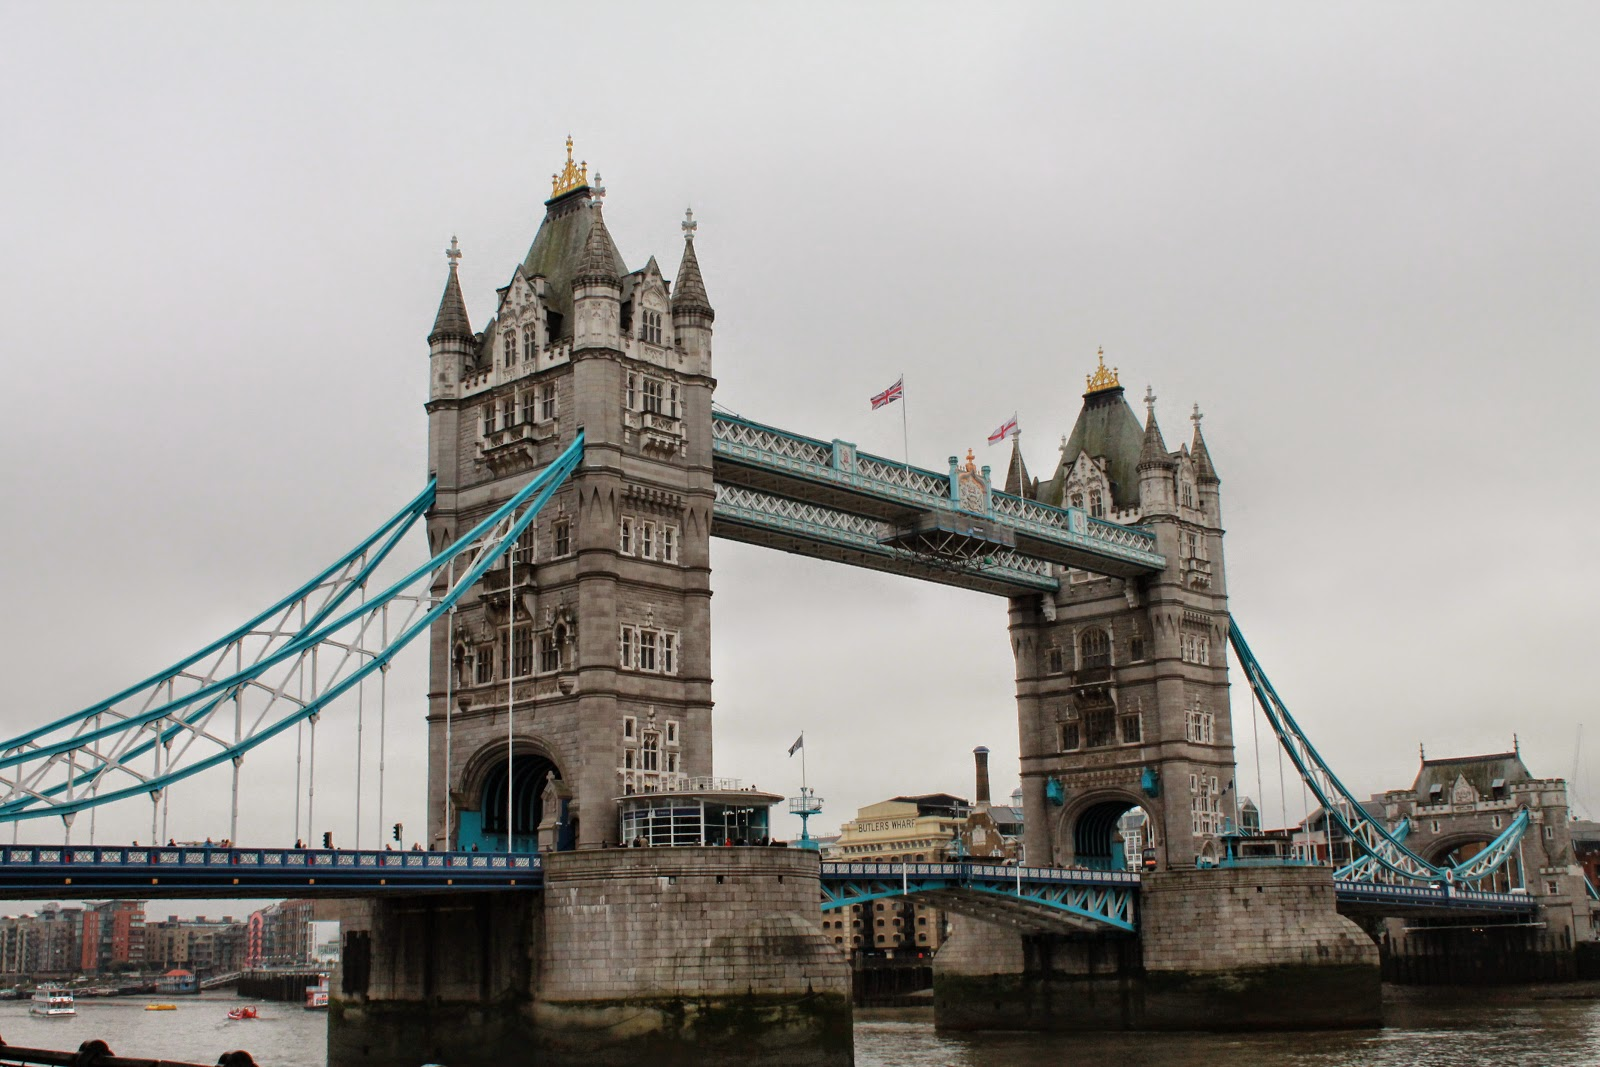 Viaje a Londrés. Parte IV. Final de recorrido.